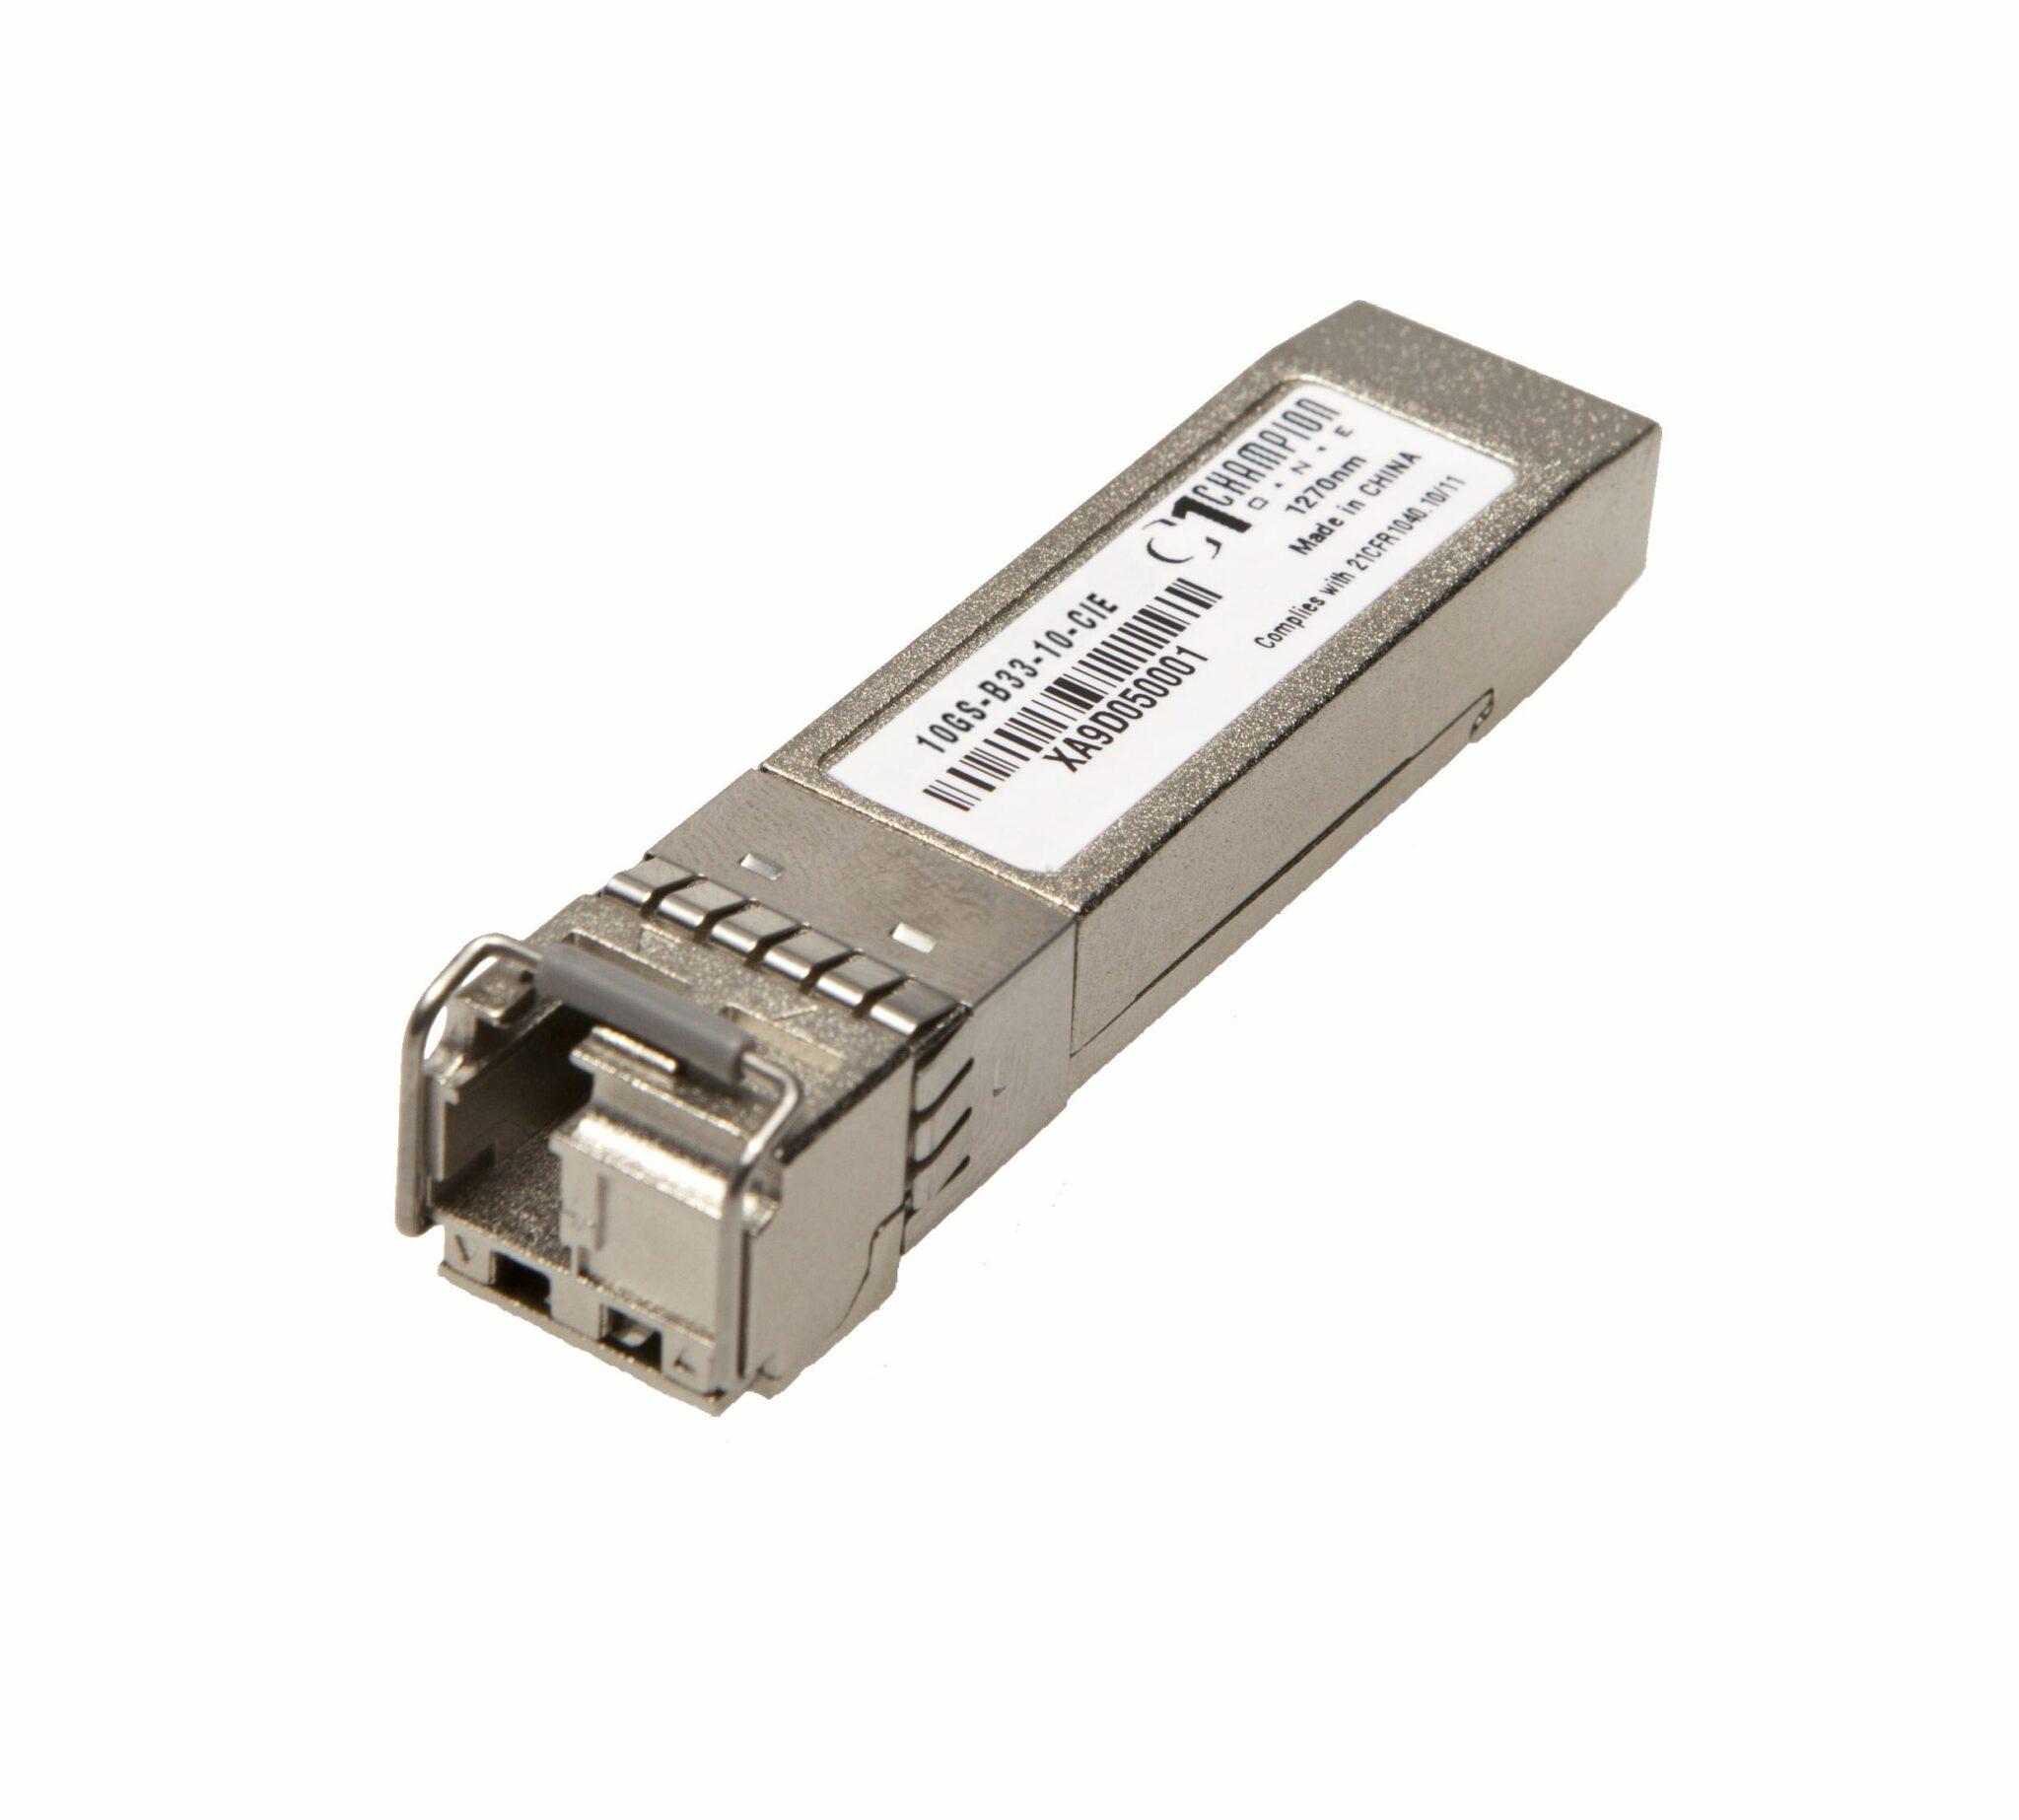 SFP+ SF 10GBase-ER 1330nm 40km, Ciena compatible